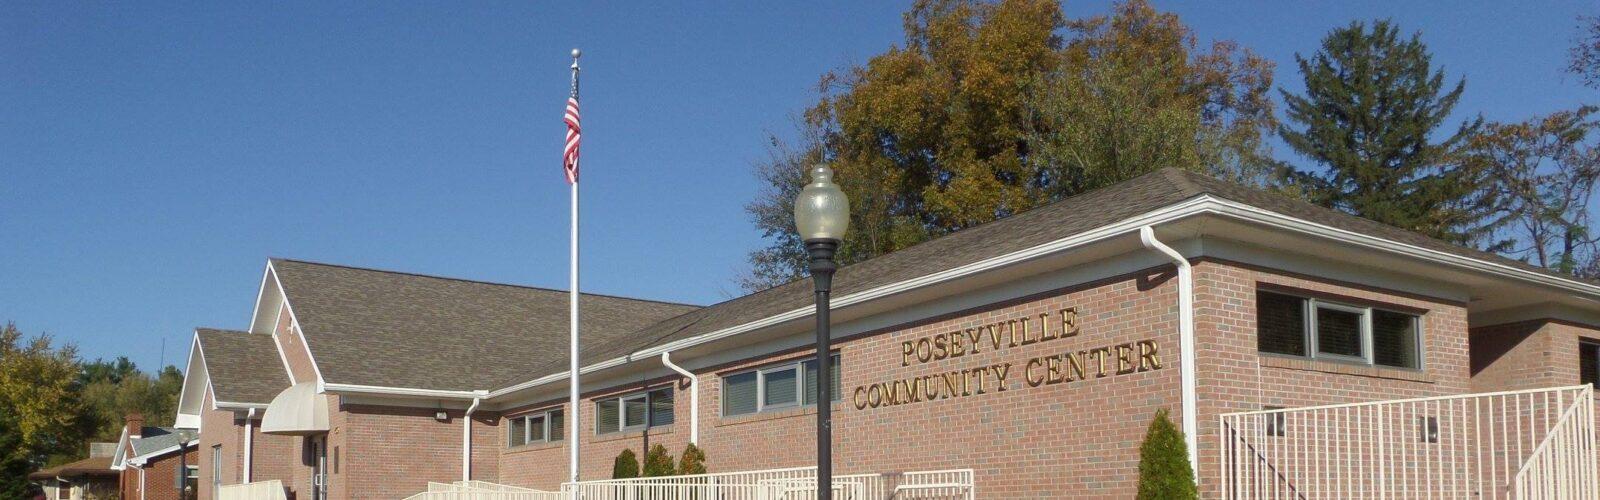 Poseyville Indiana Community Center